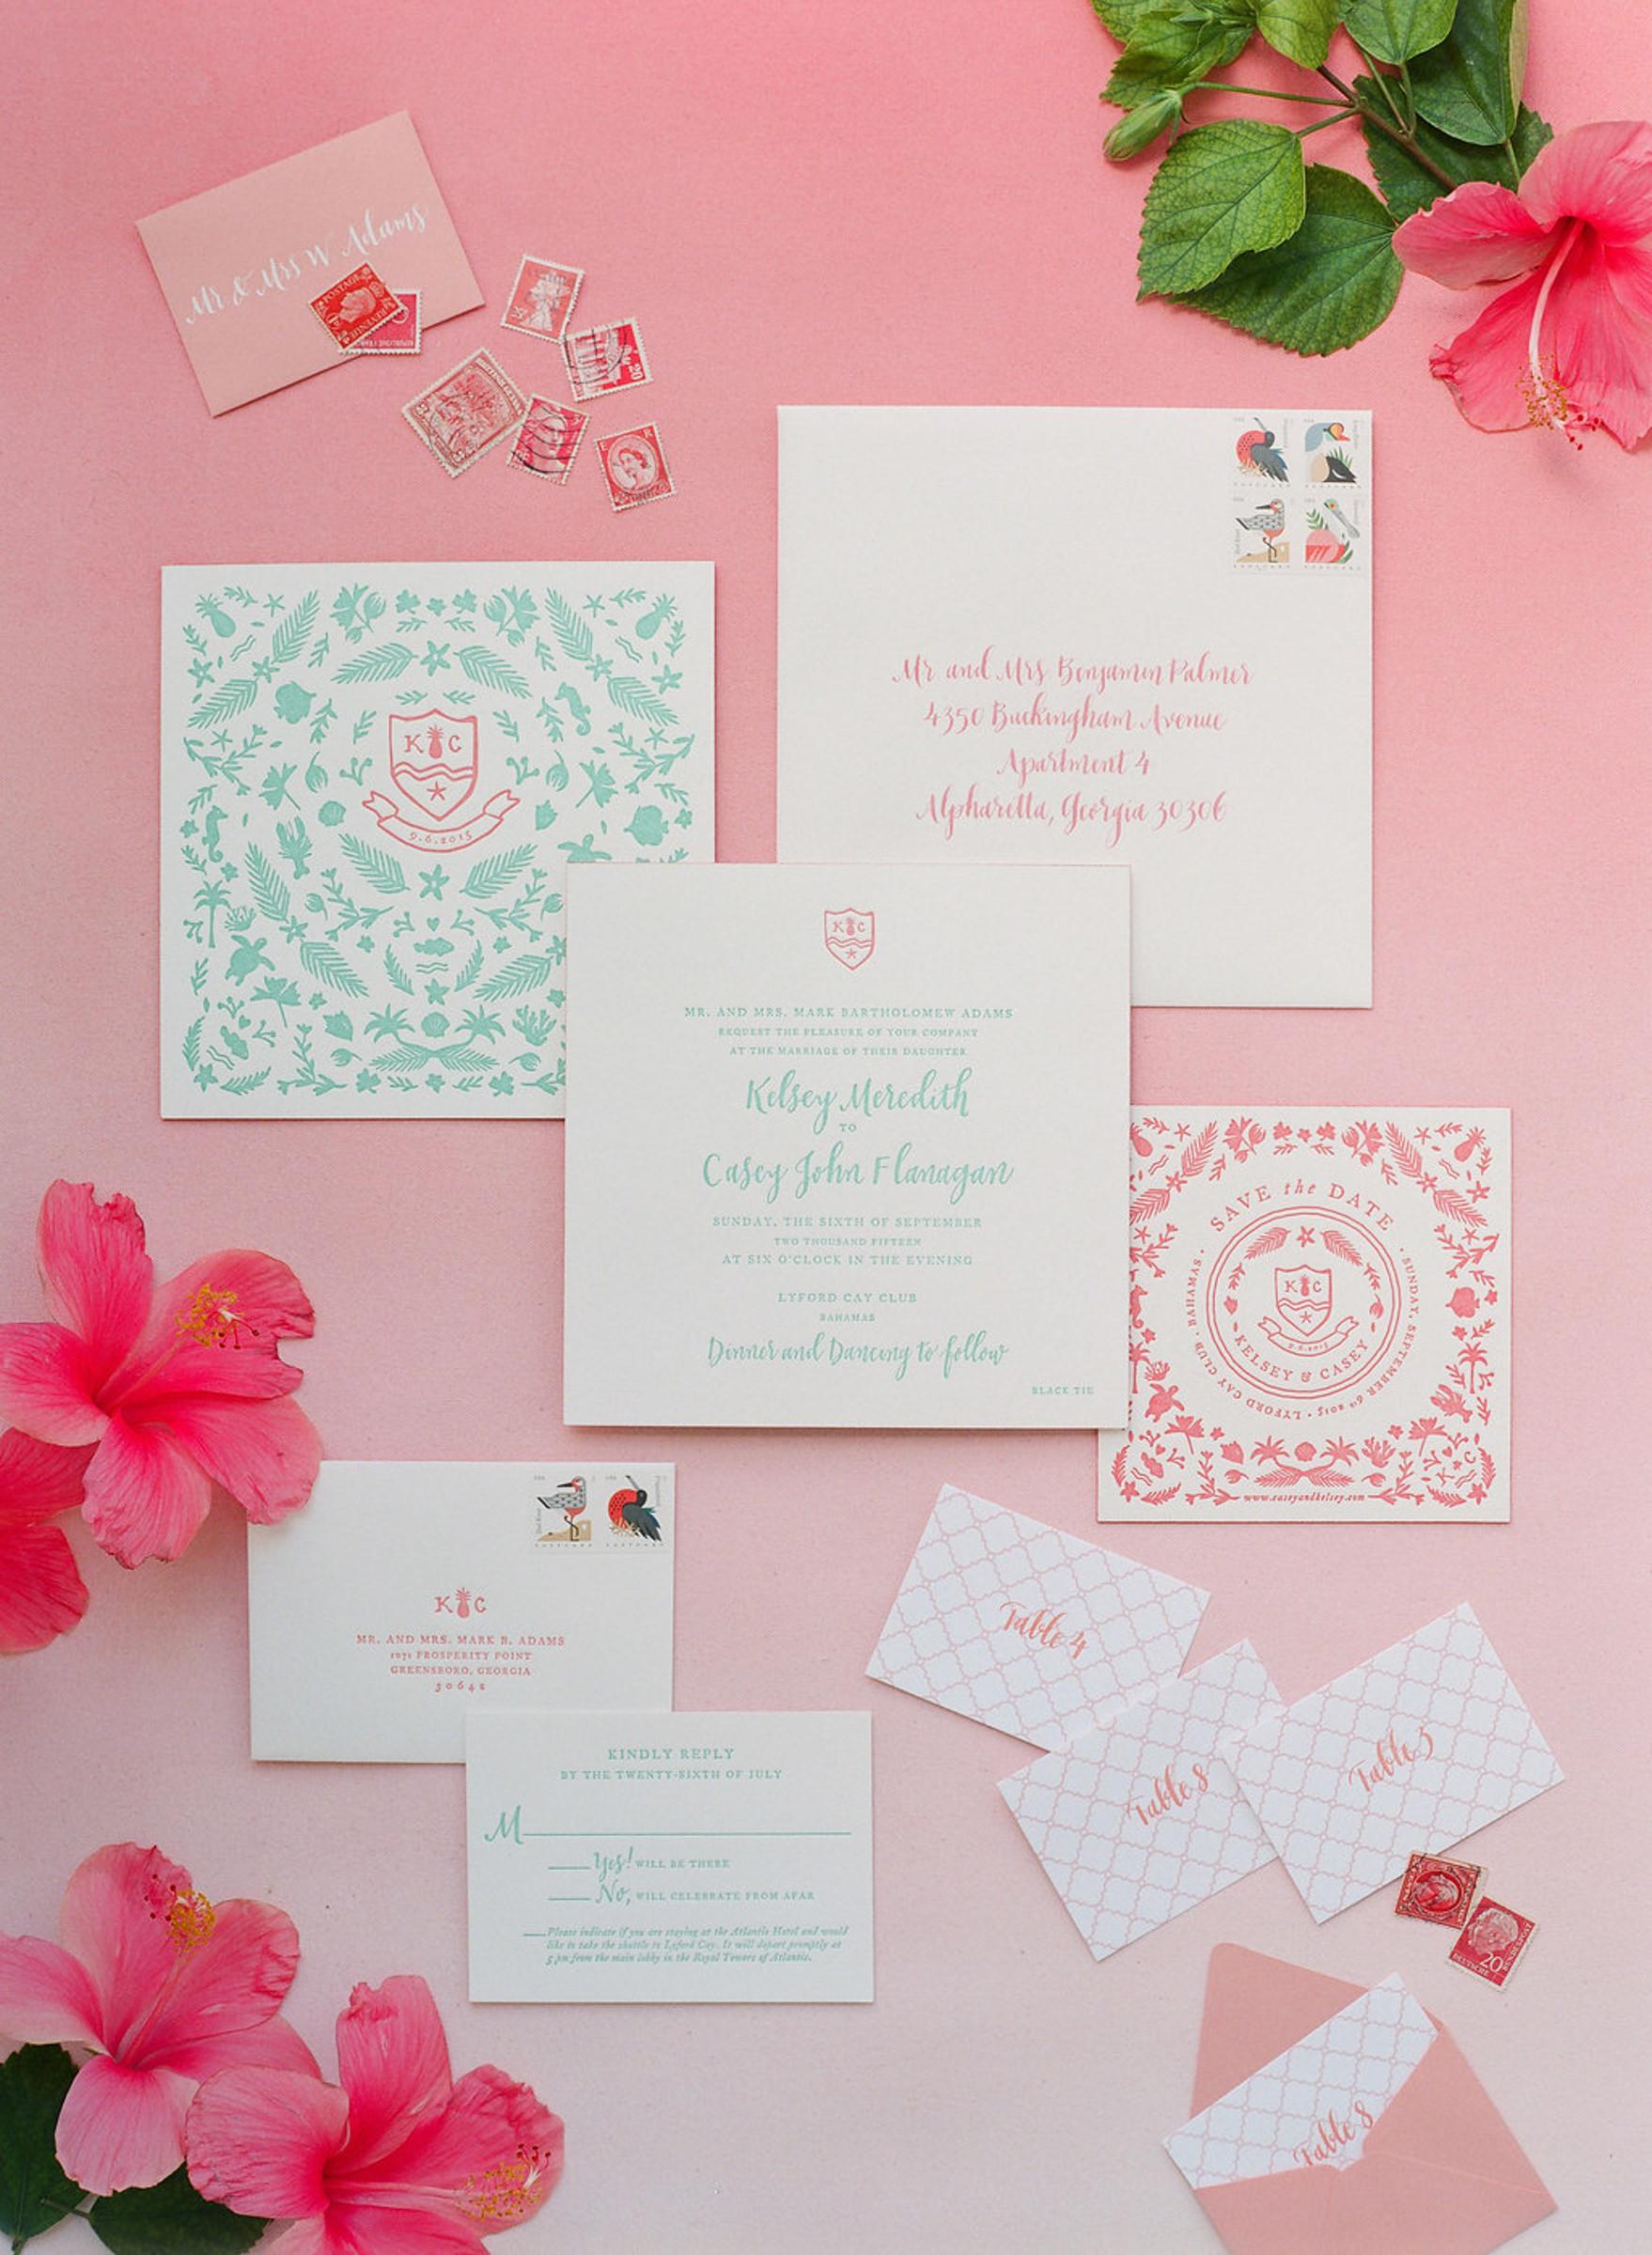 Aqua and pink stamp design invitations by Corbin Gurkin